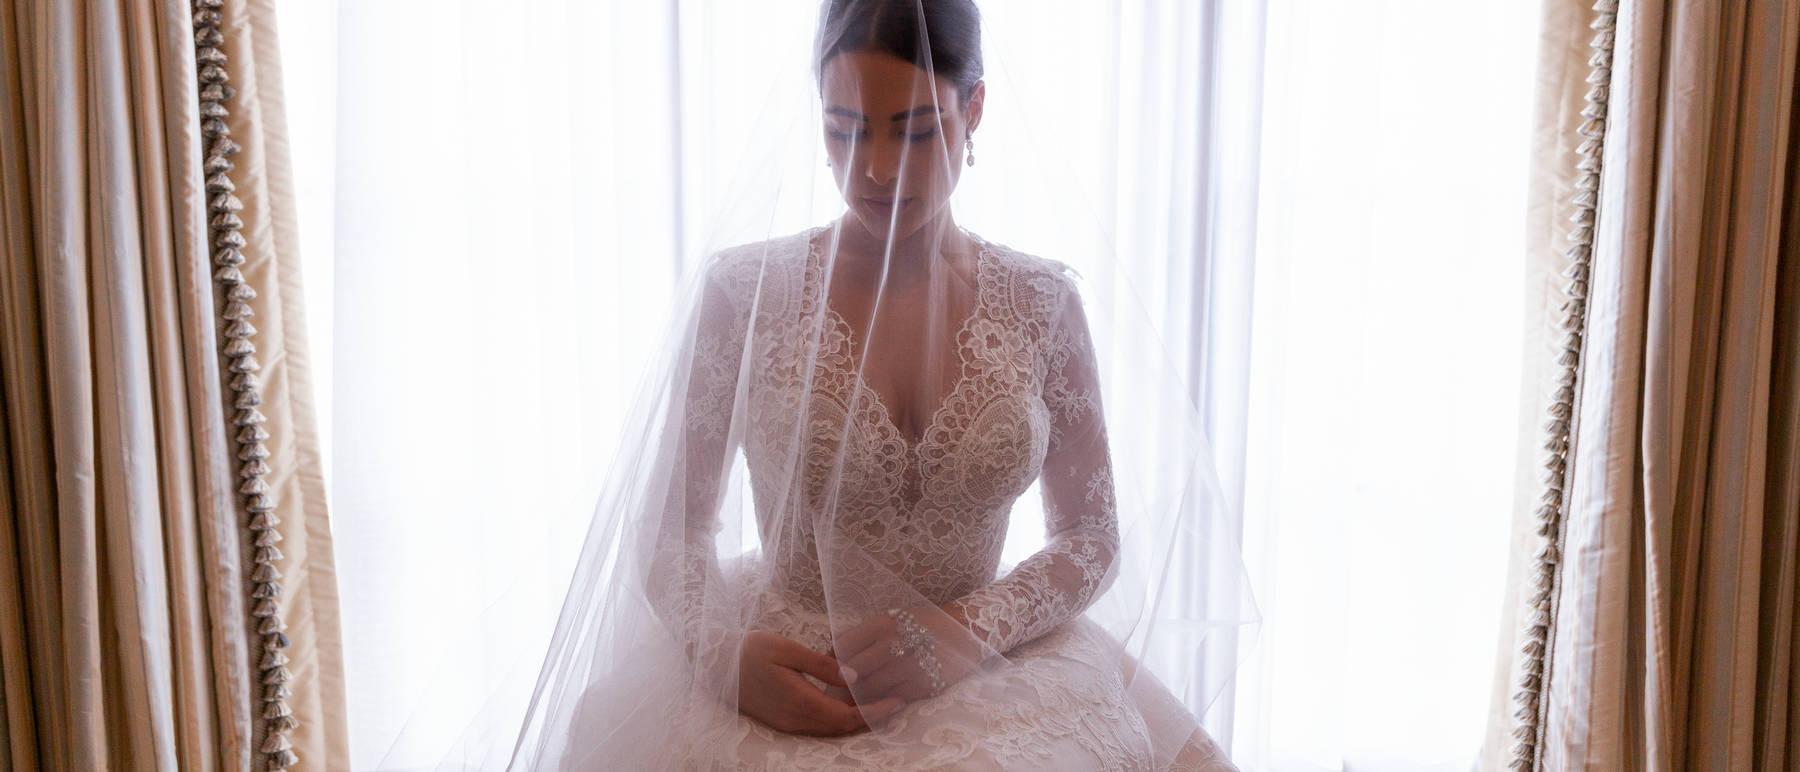 johnandjoseph-wedding-photographer-hz-slider-322